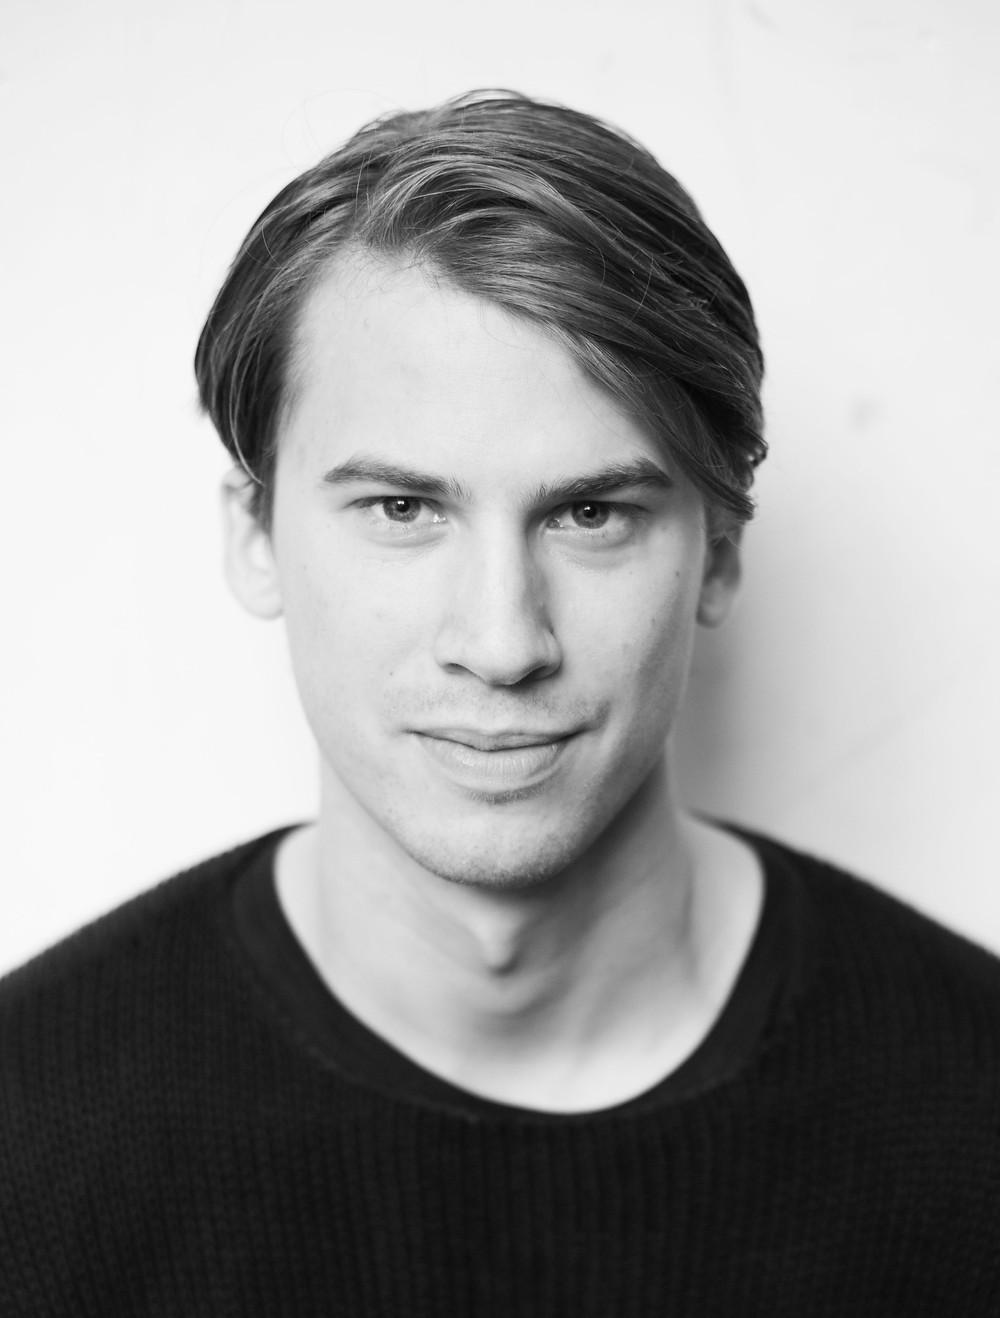 företagsfotografering stockholm jacob falkman